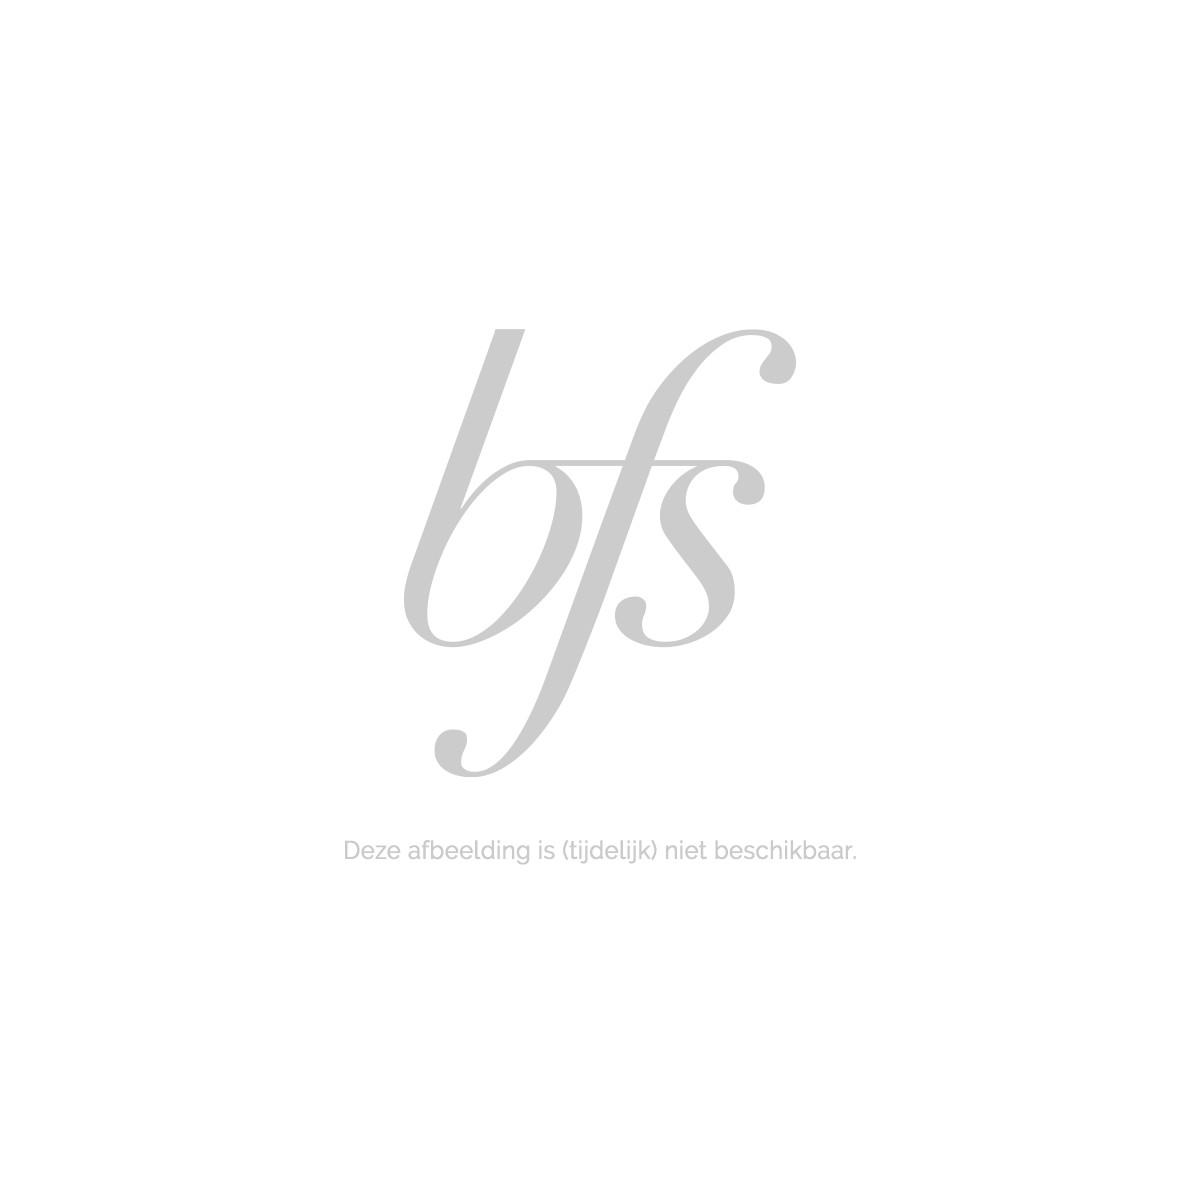 Body and Bess Body Scrub 150 Ml